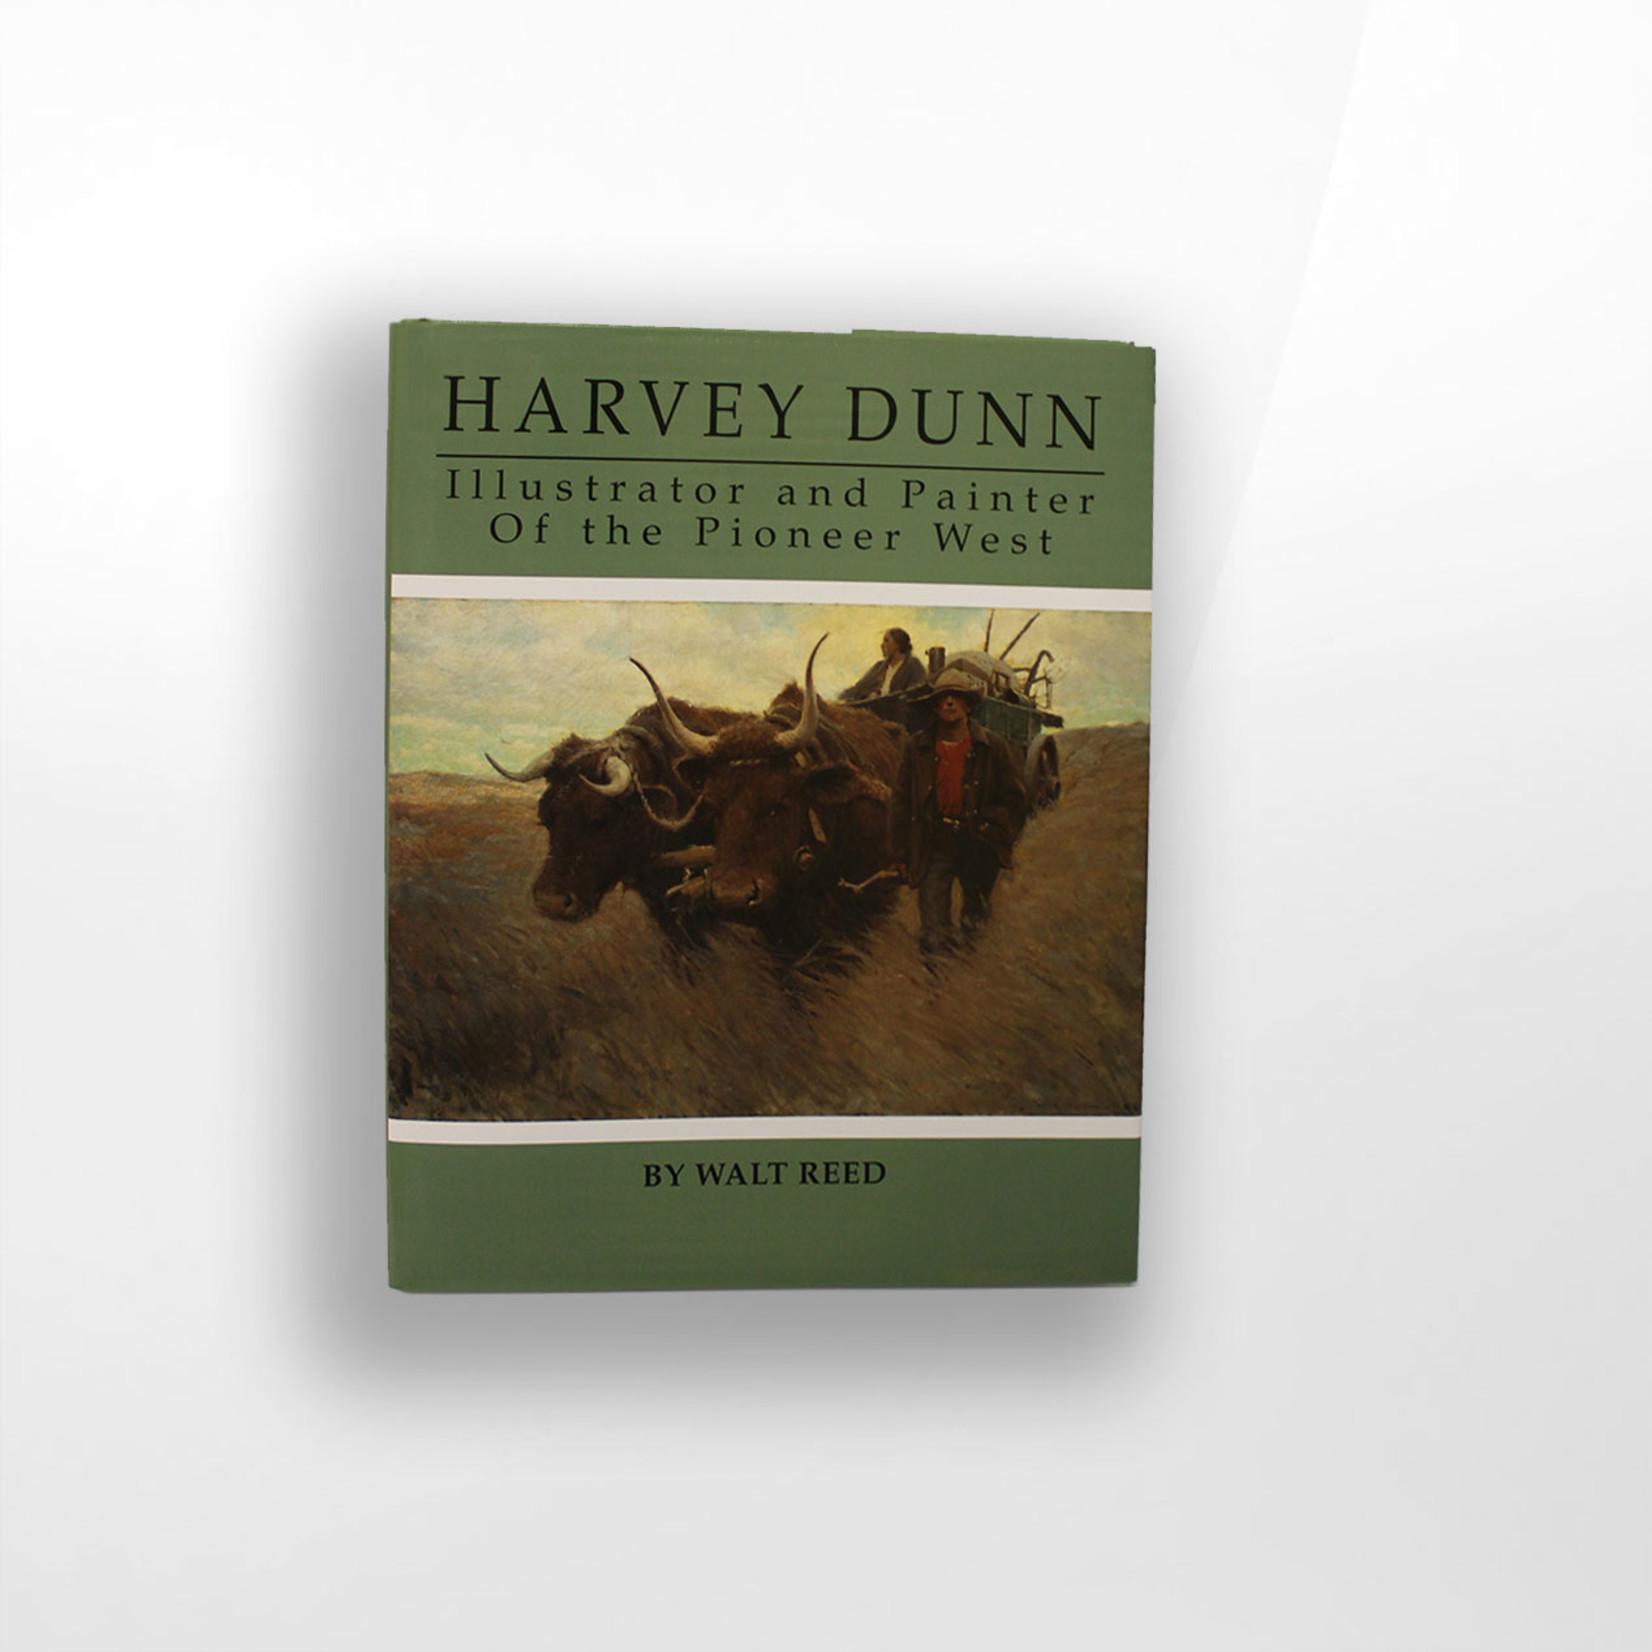 Dunn Merchandise Harvey Dunn, Illustrator and Painter of the Pioneer West